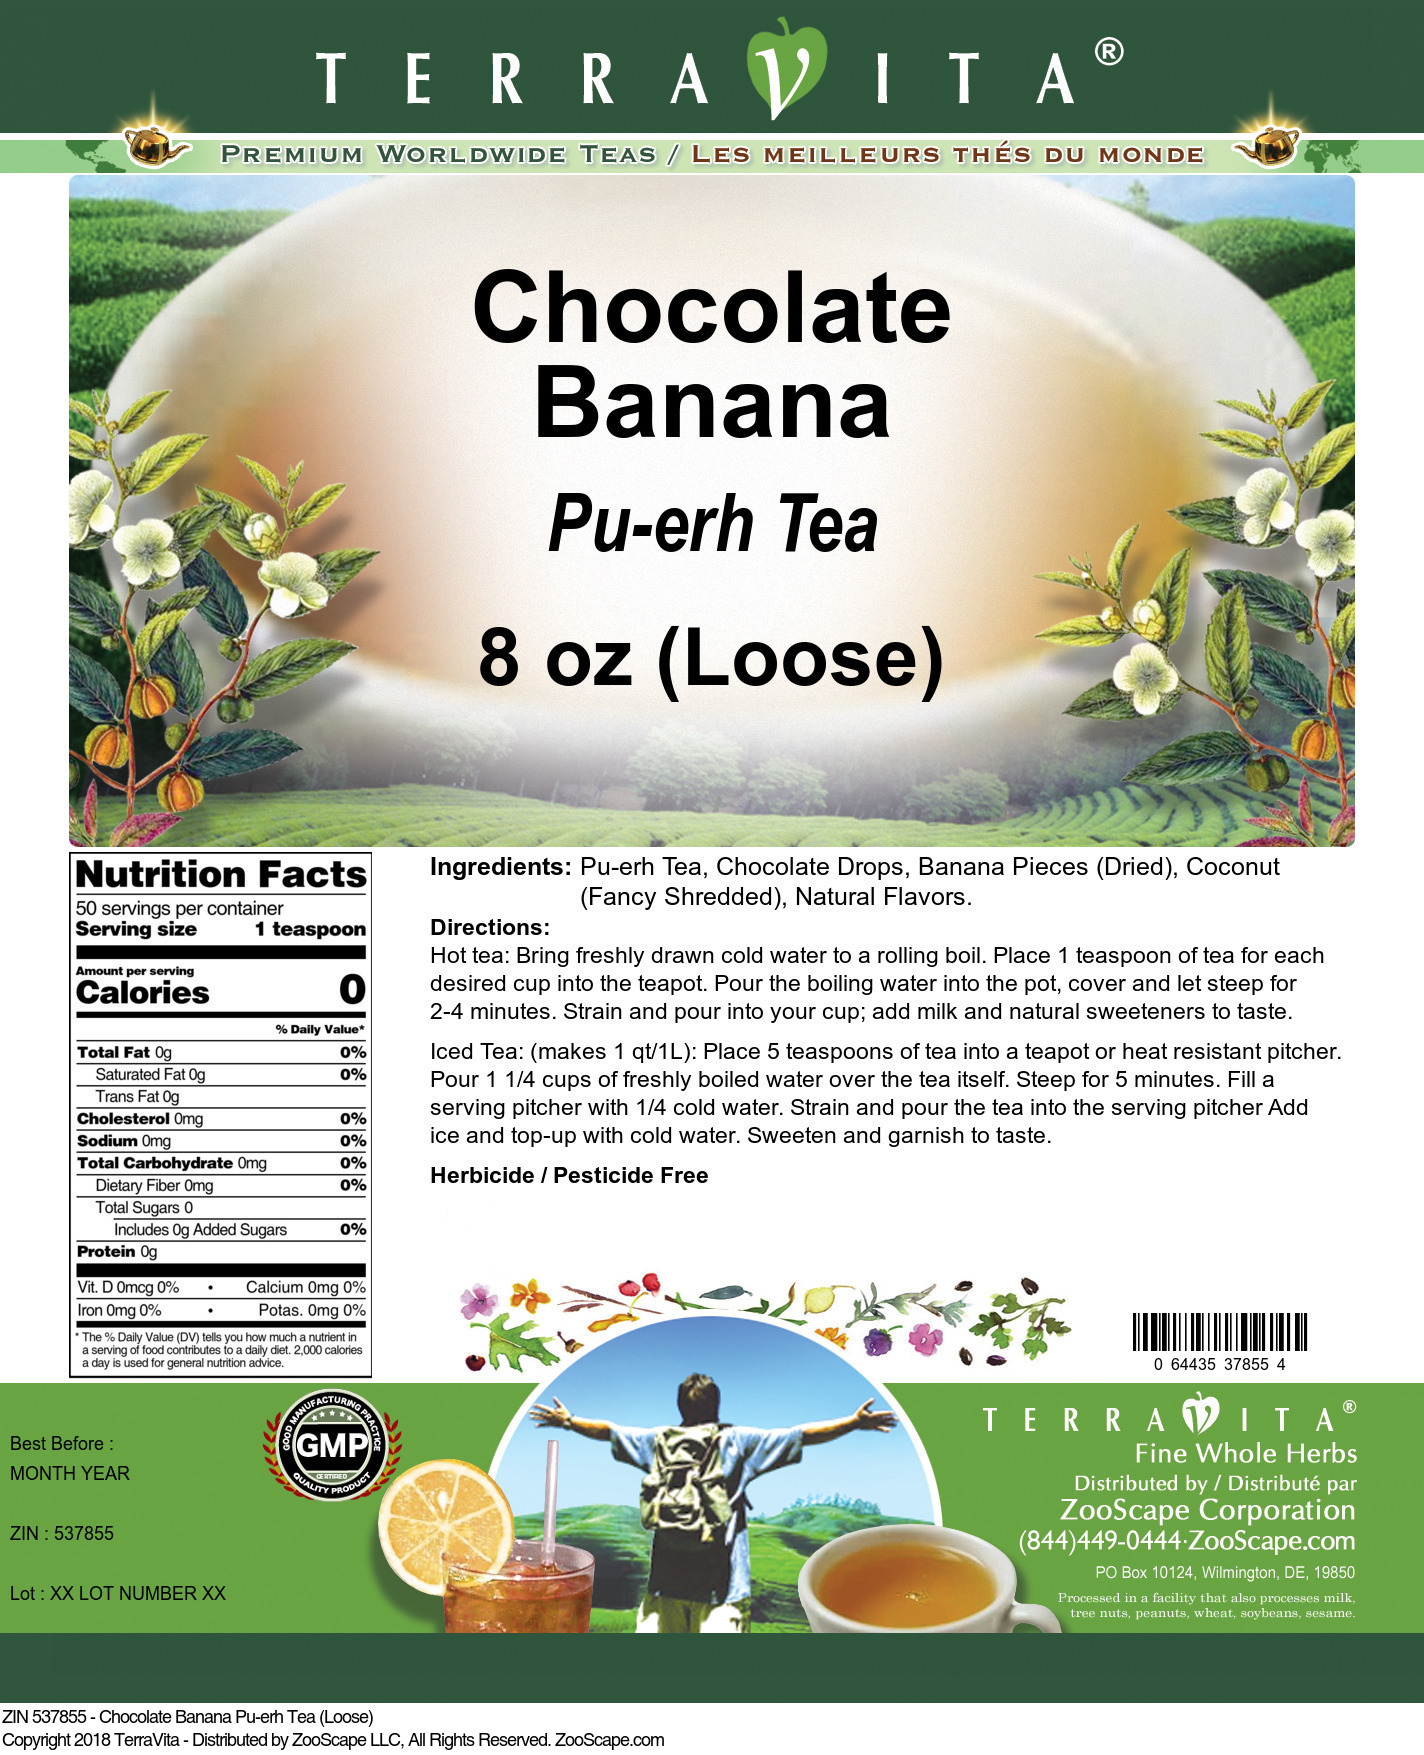 Chocolate Banana Pu-erh Tea (Loose)